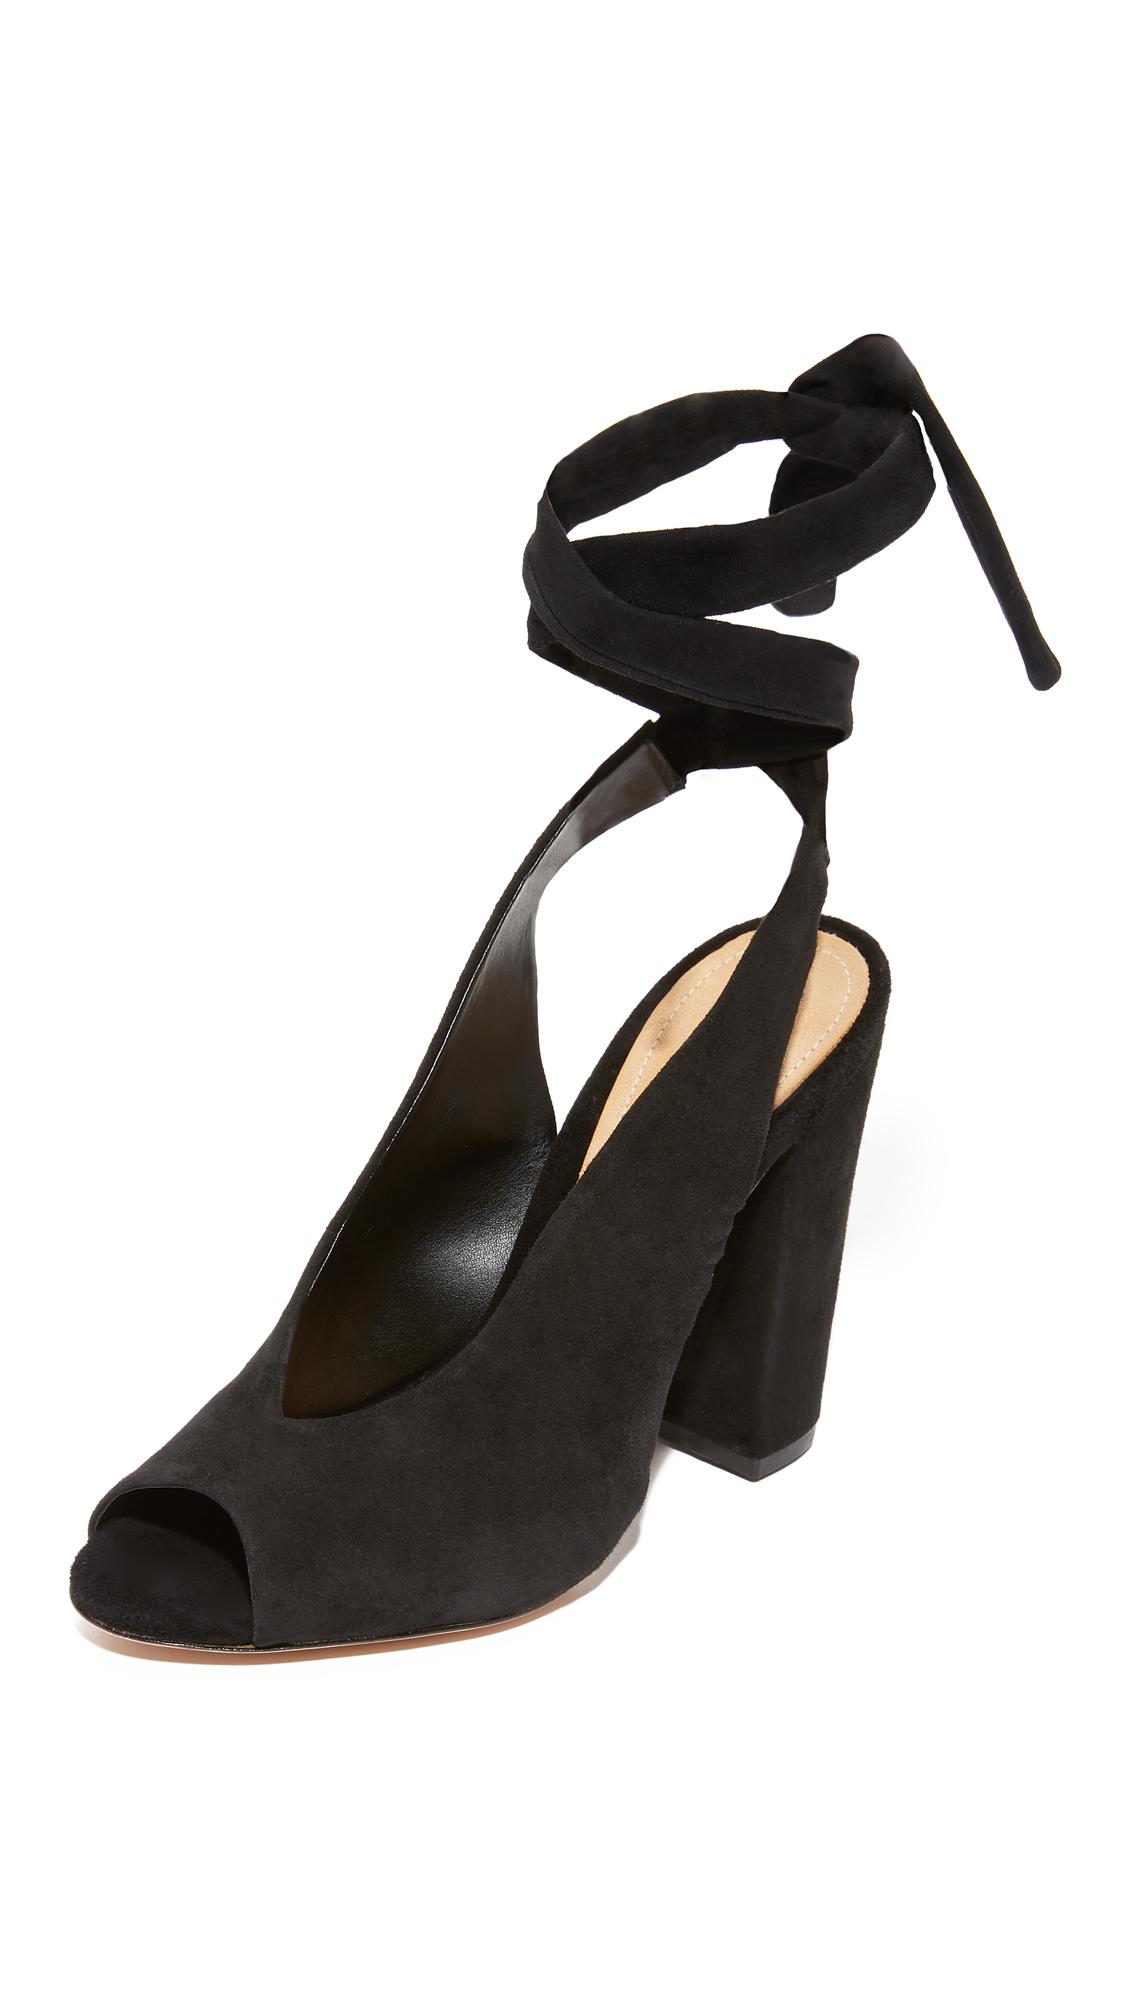 Schutz Archie Wrap Peep Toe Heels - Black